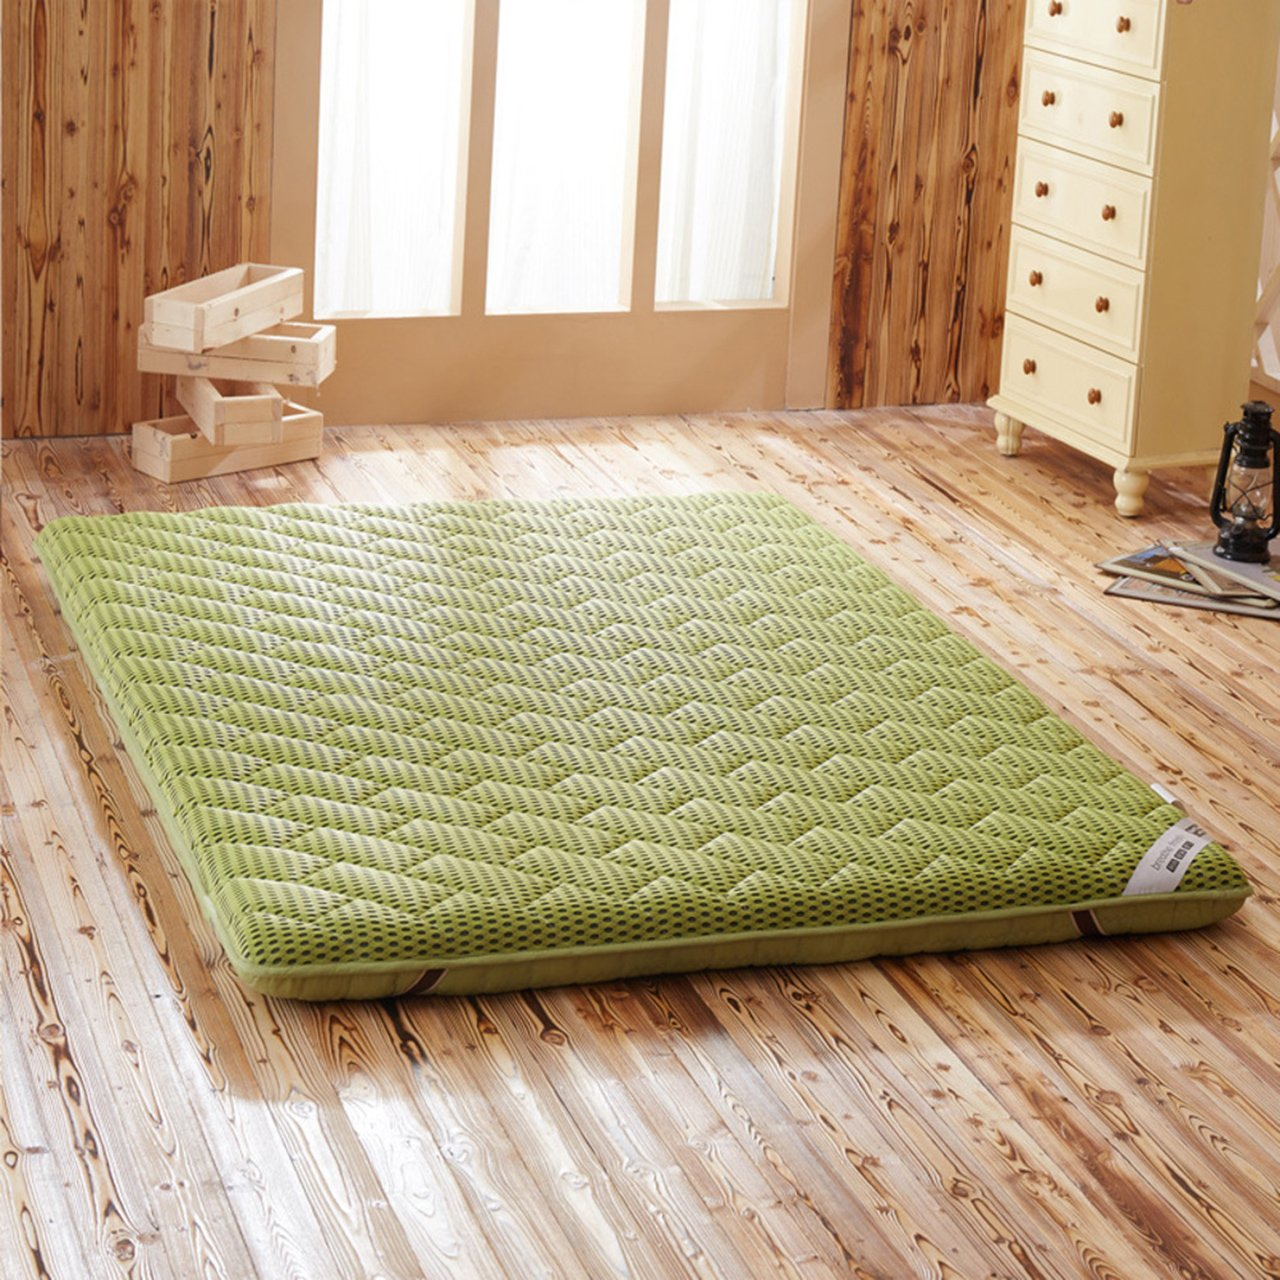 Yellow star Student dorm mattress,Breathable tatami floor mat double futon mattress topper portable sleeping pad non-slip foldable cushion mats-B 90x200cm(35x79inch)